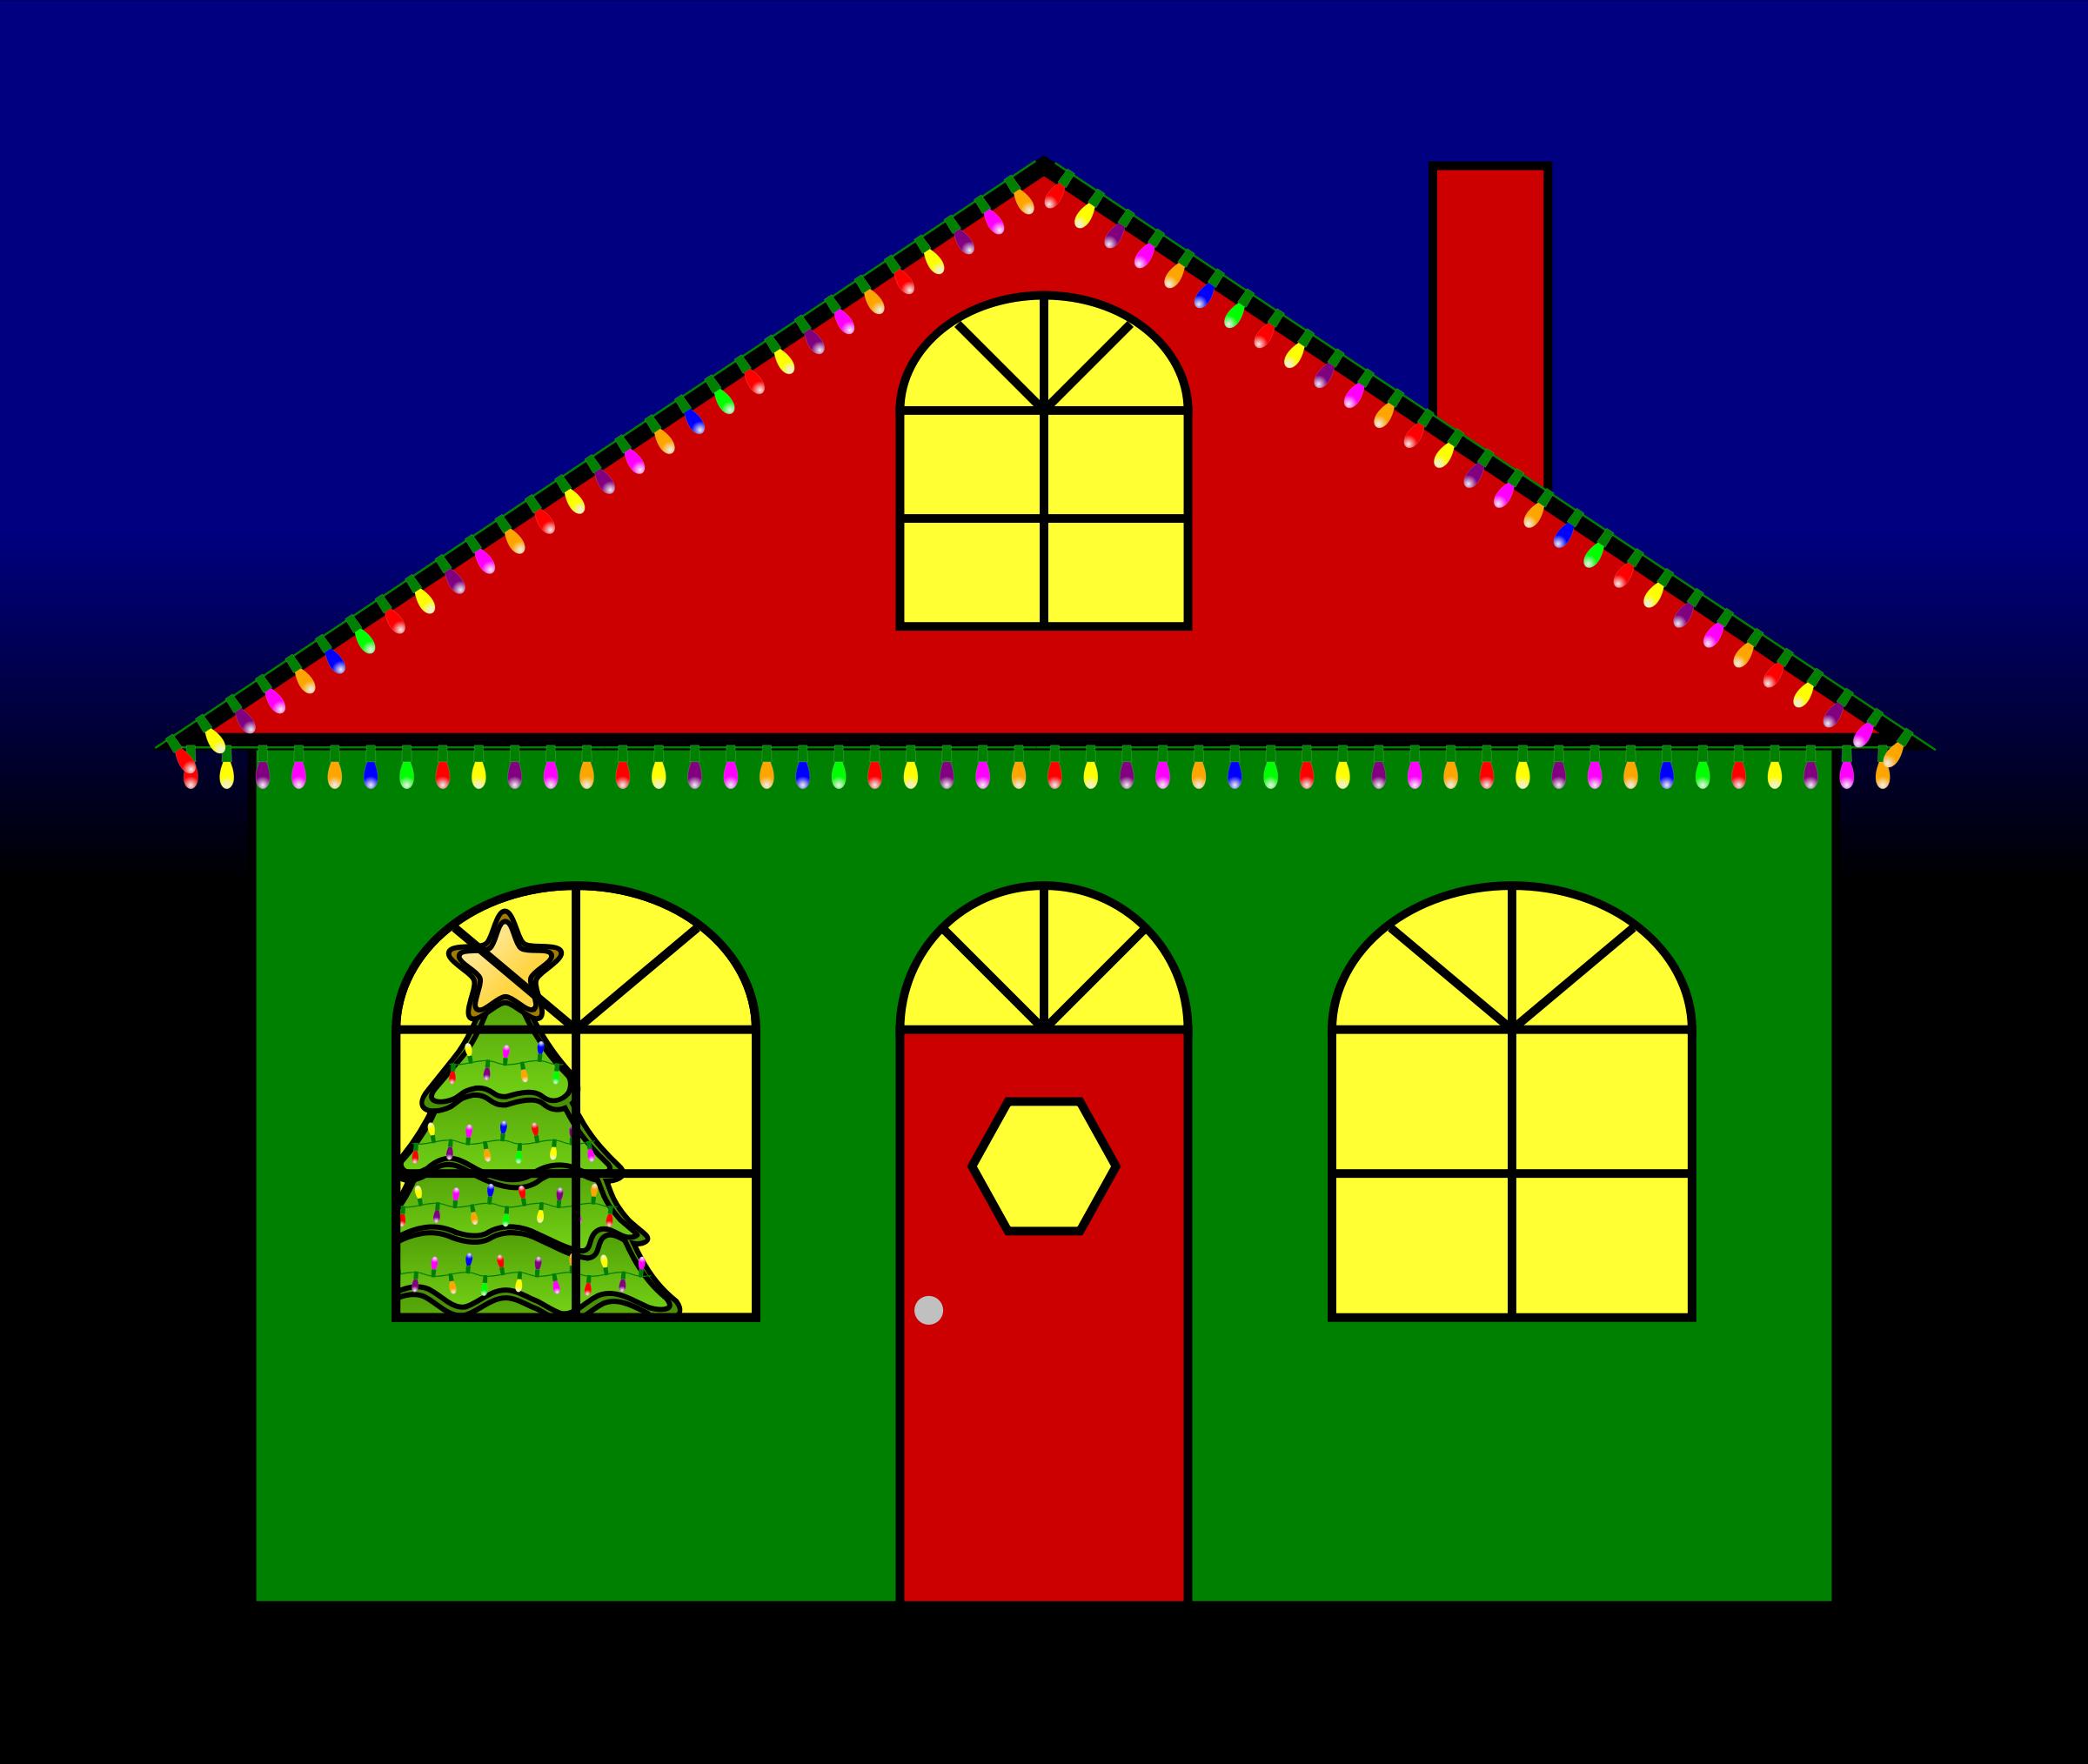 Window clipart street svg transparent download Free Street House Cliparts, Download Free Clip Art, Free ... svg transparent download